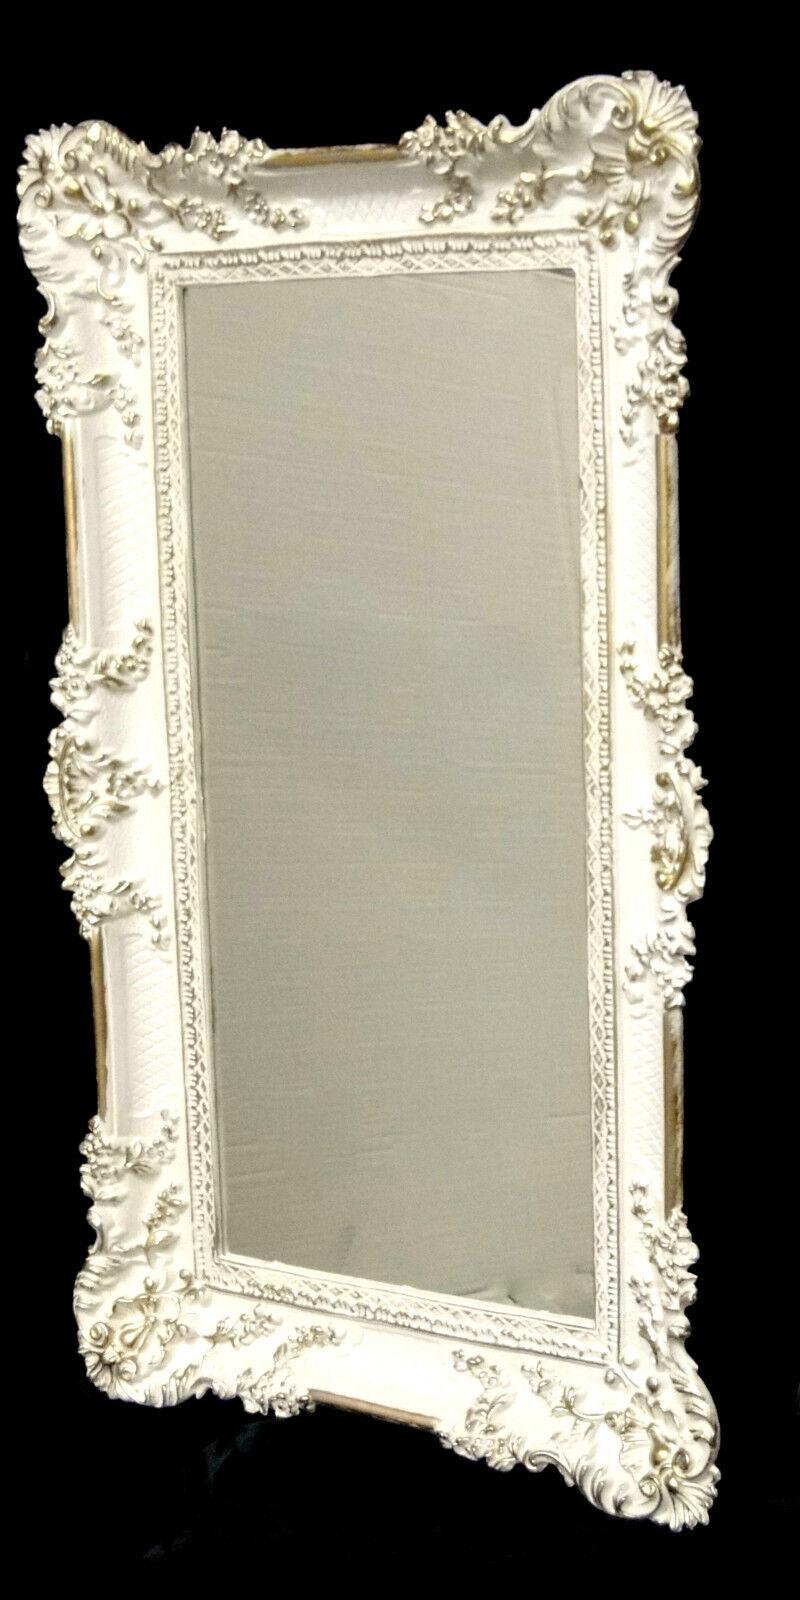 wandspiegel antik spiegel wei 96x57 badspiegel xxl. Black Bedroom Furniture Sets. Home Design Ideas